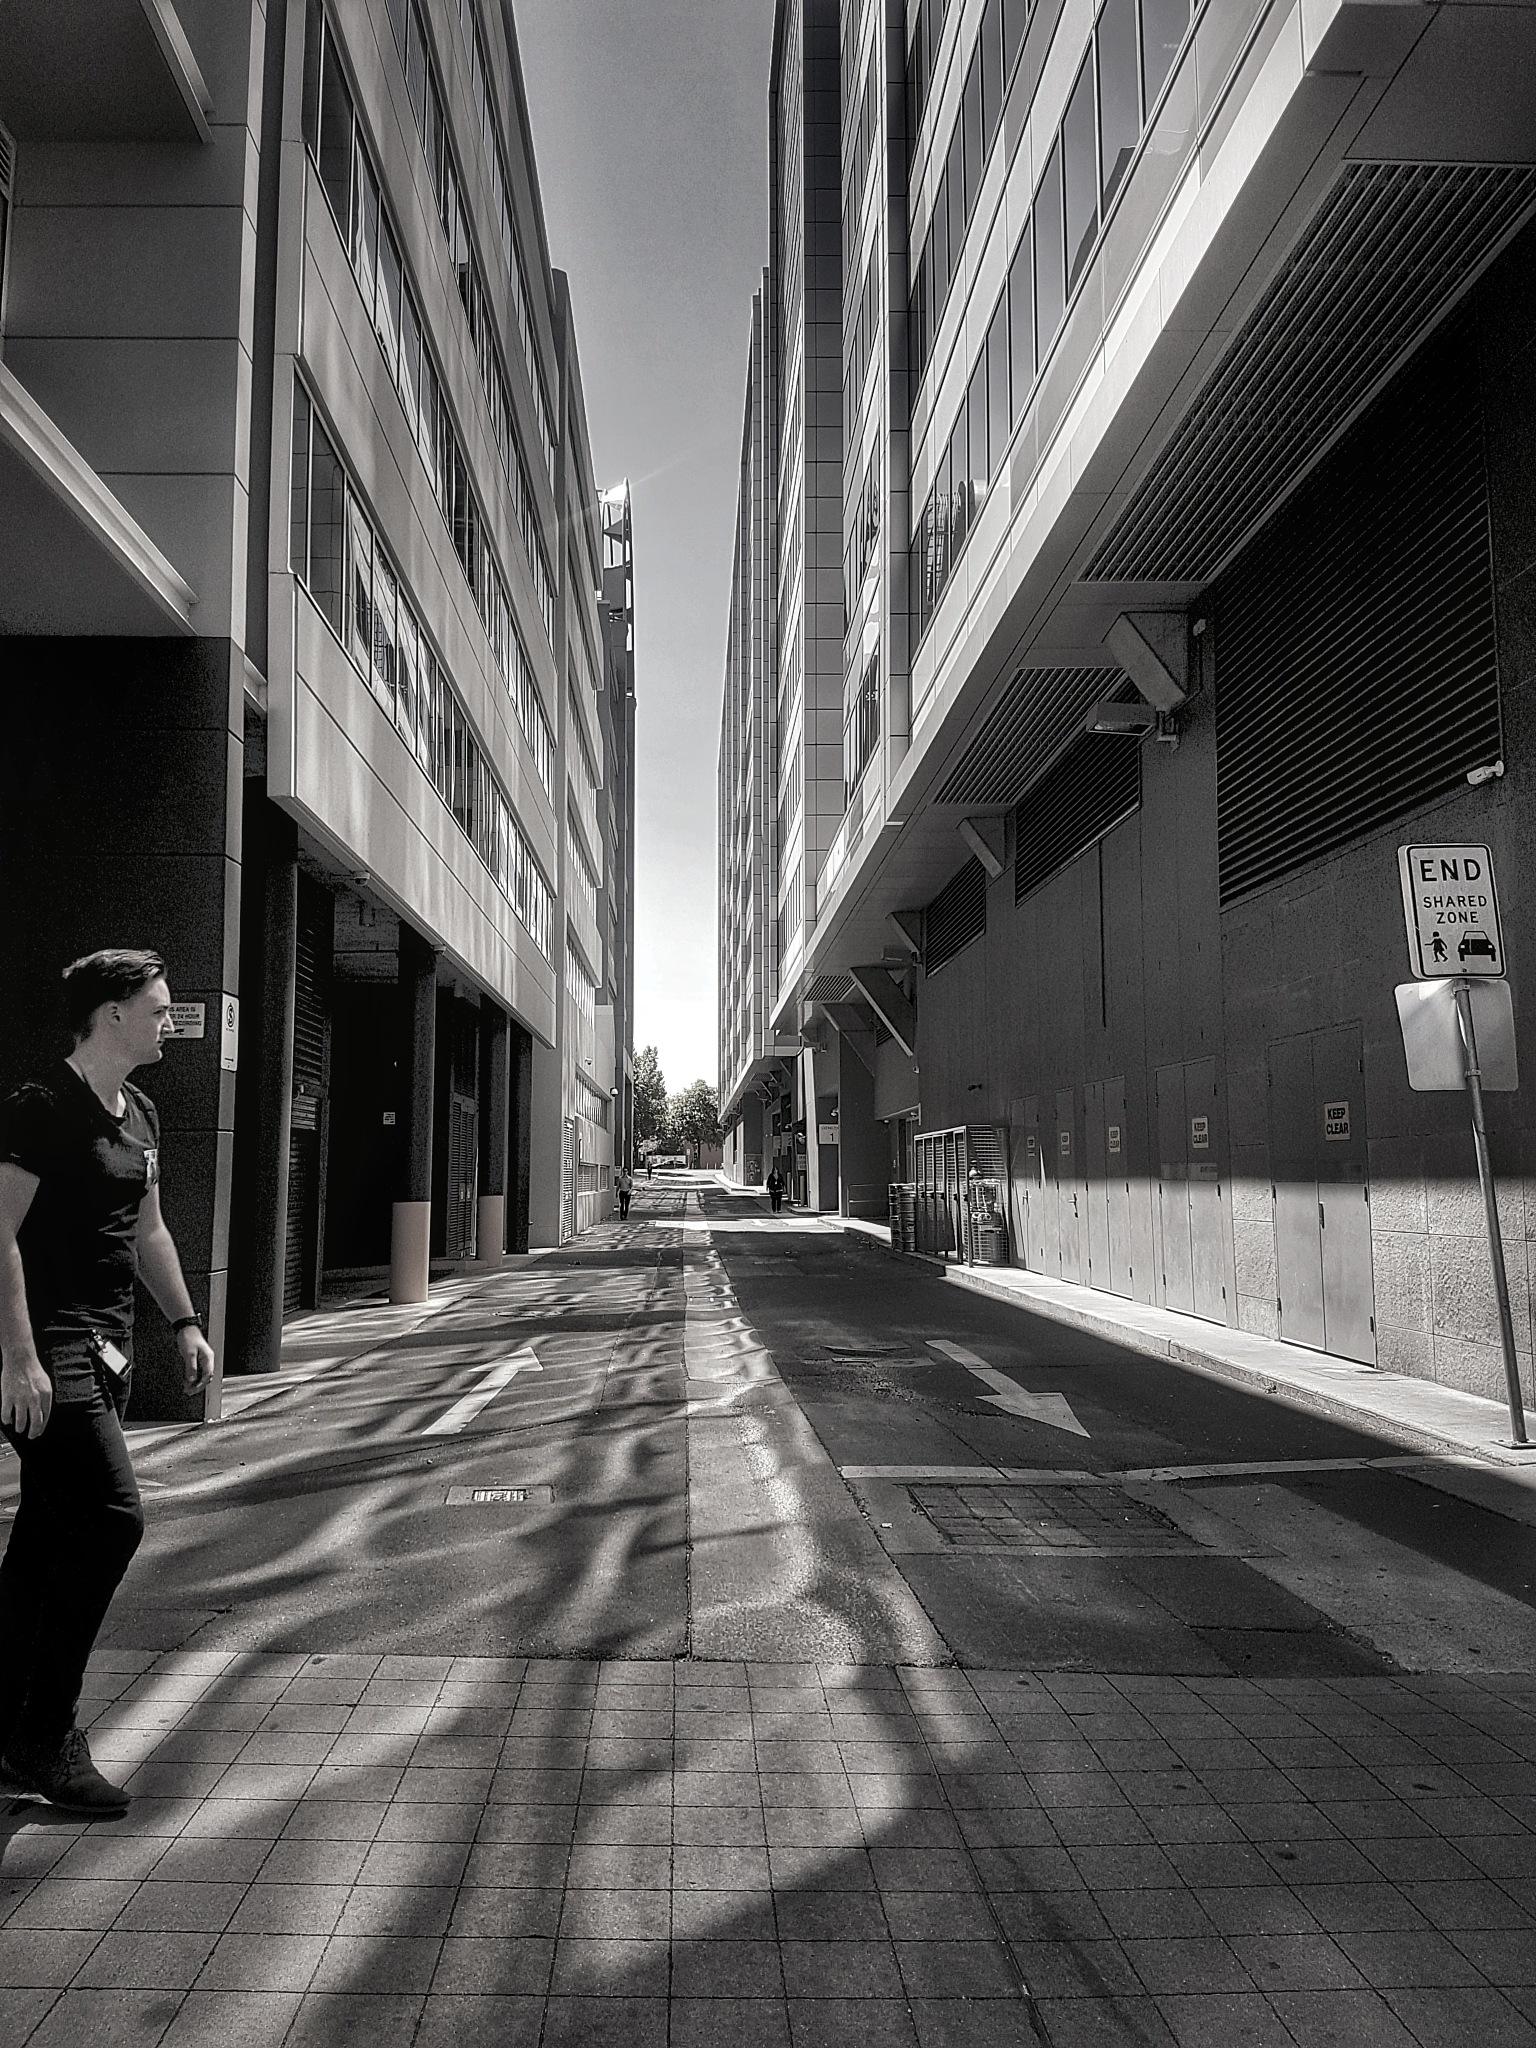 Through the Gap by Tom